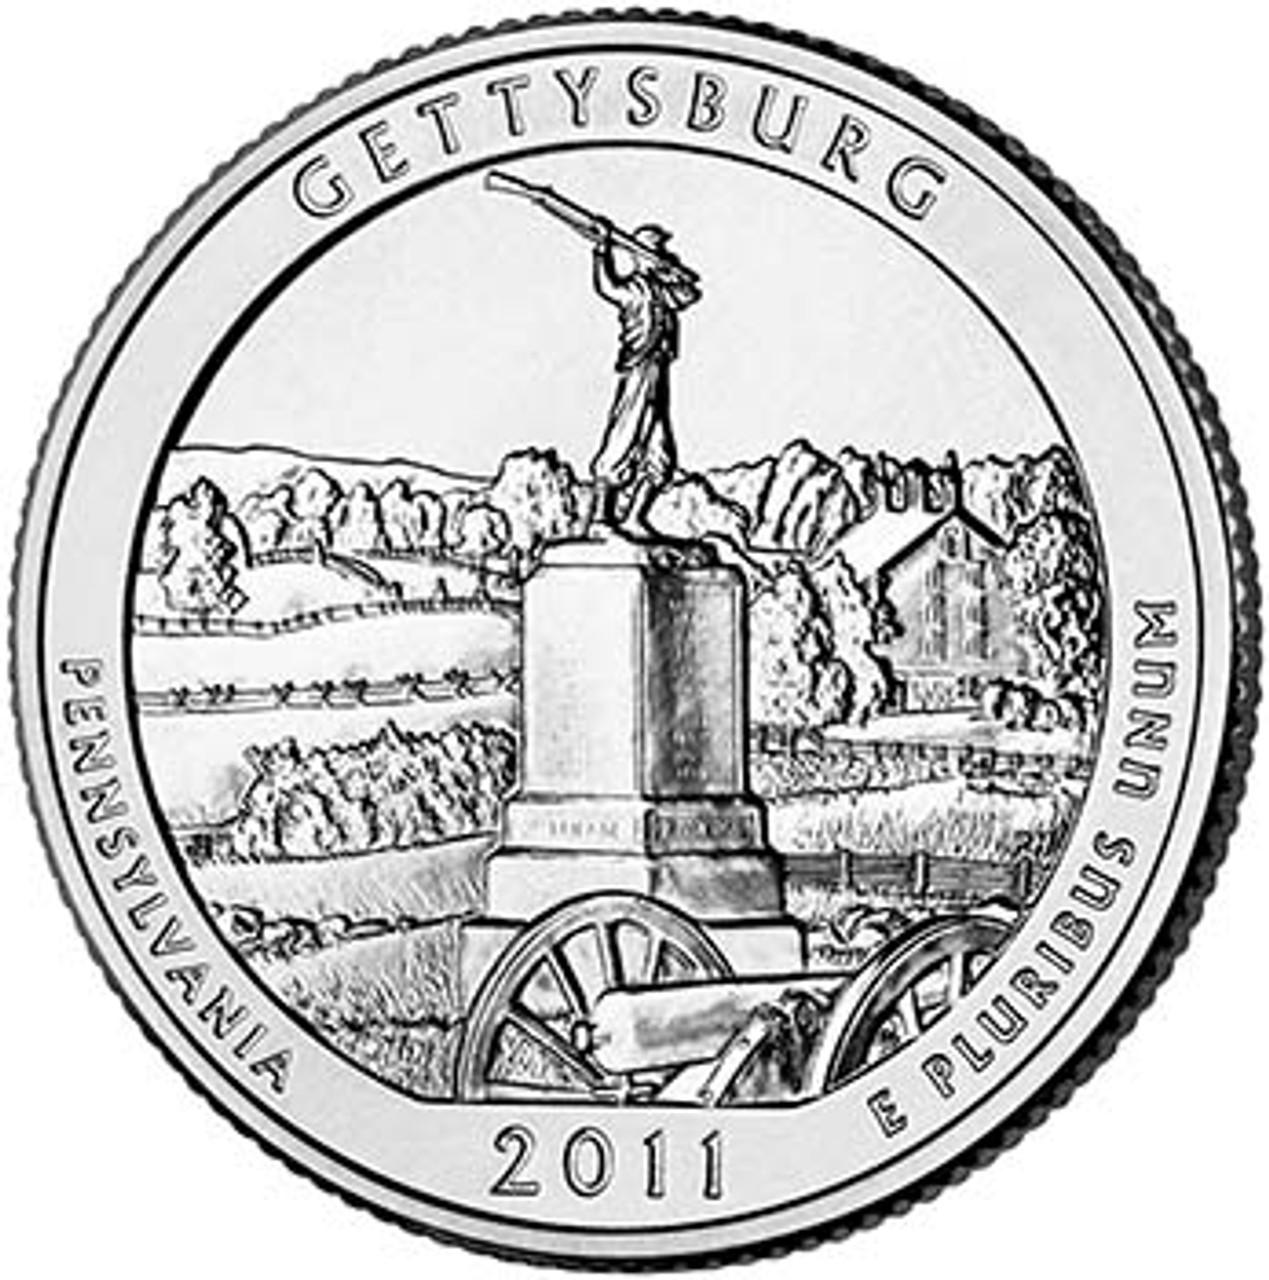 2011-P Gettysburg National Military Park Quarter Brilliant Uncirculated Image 1